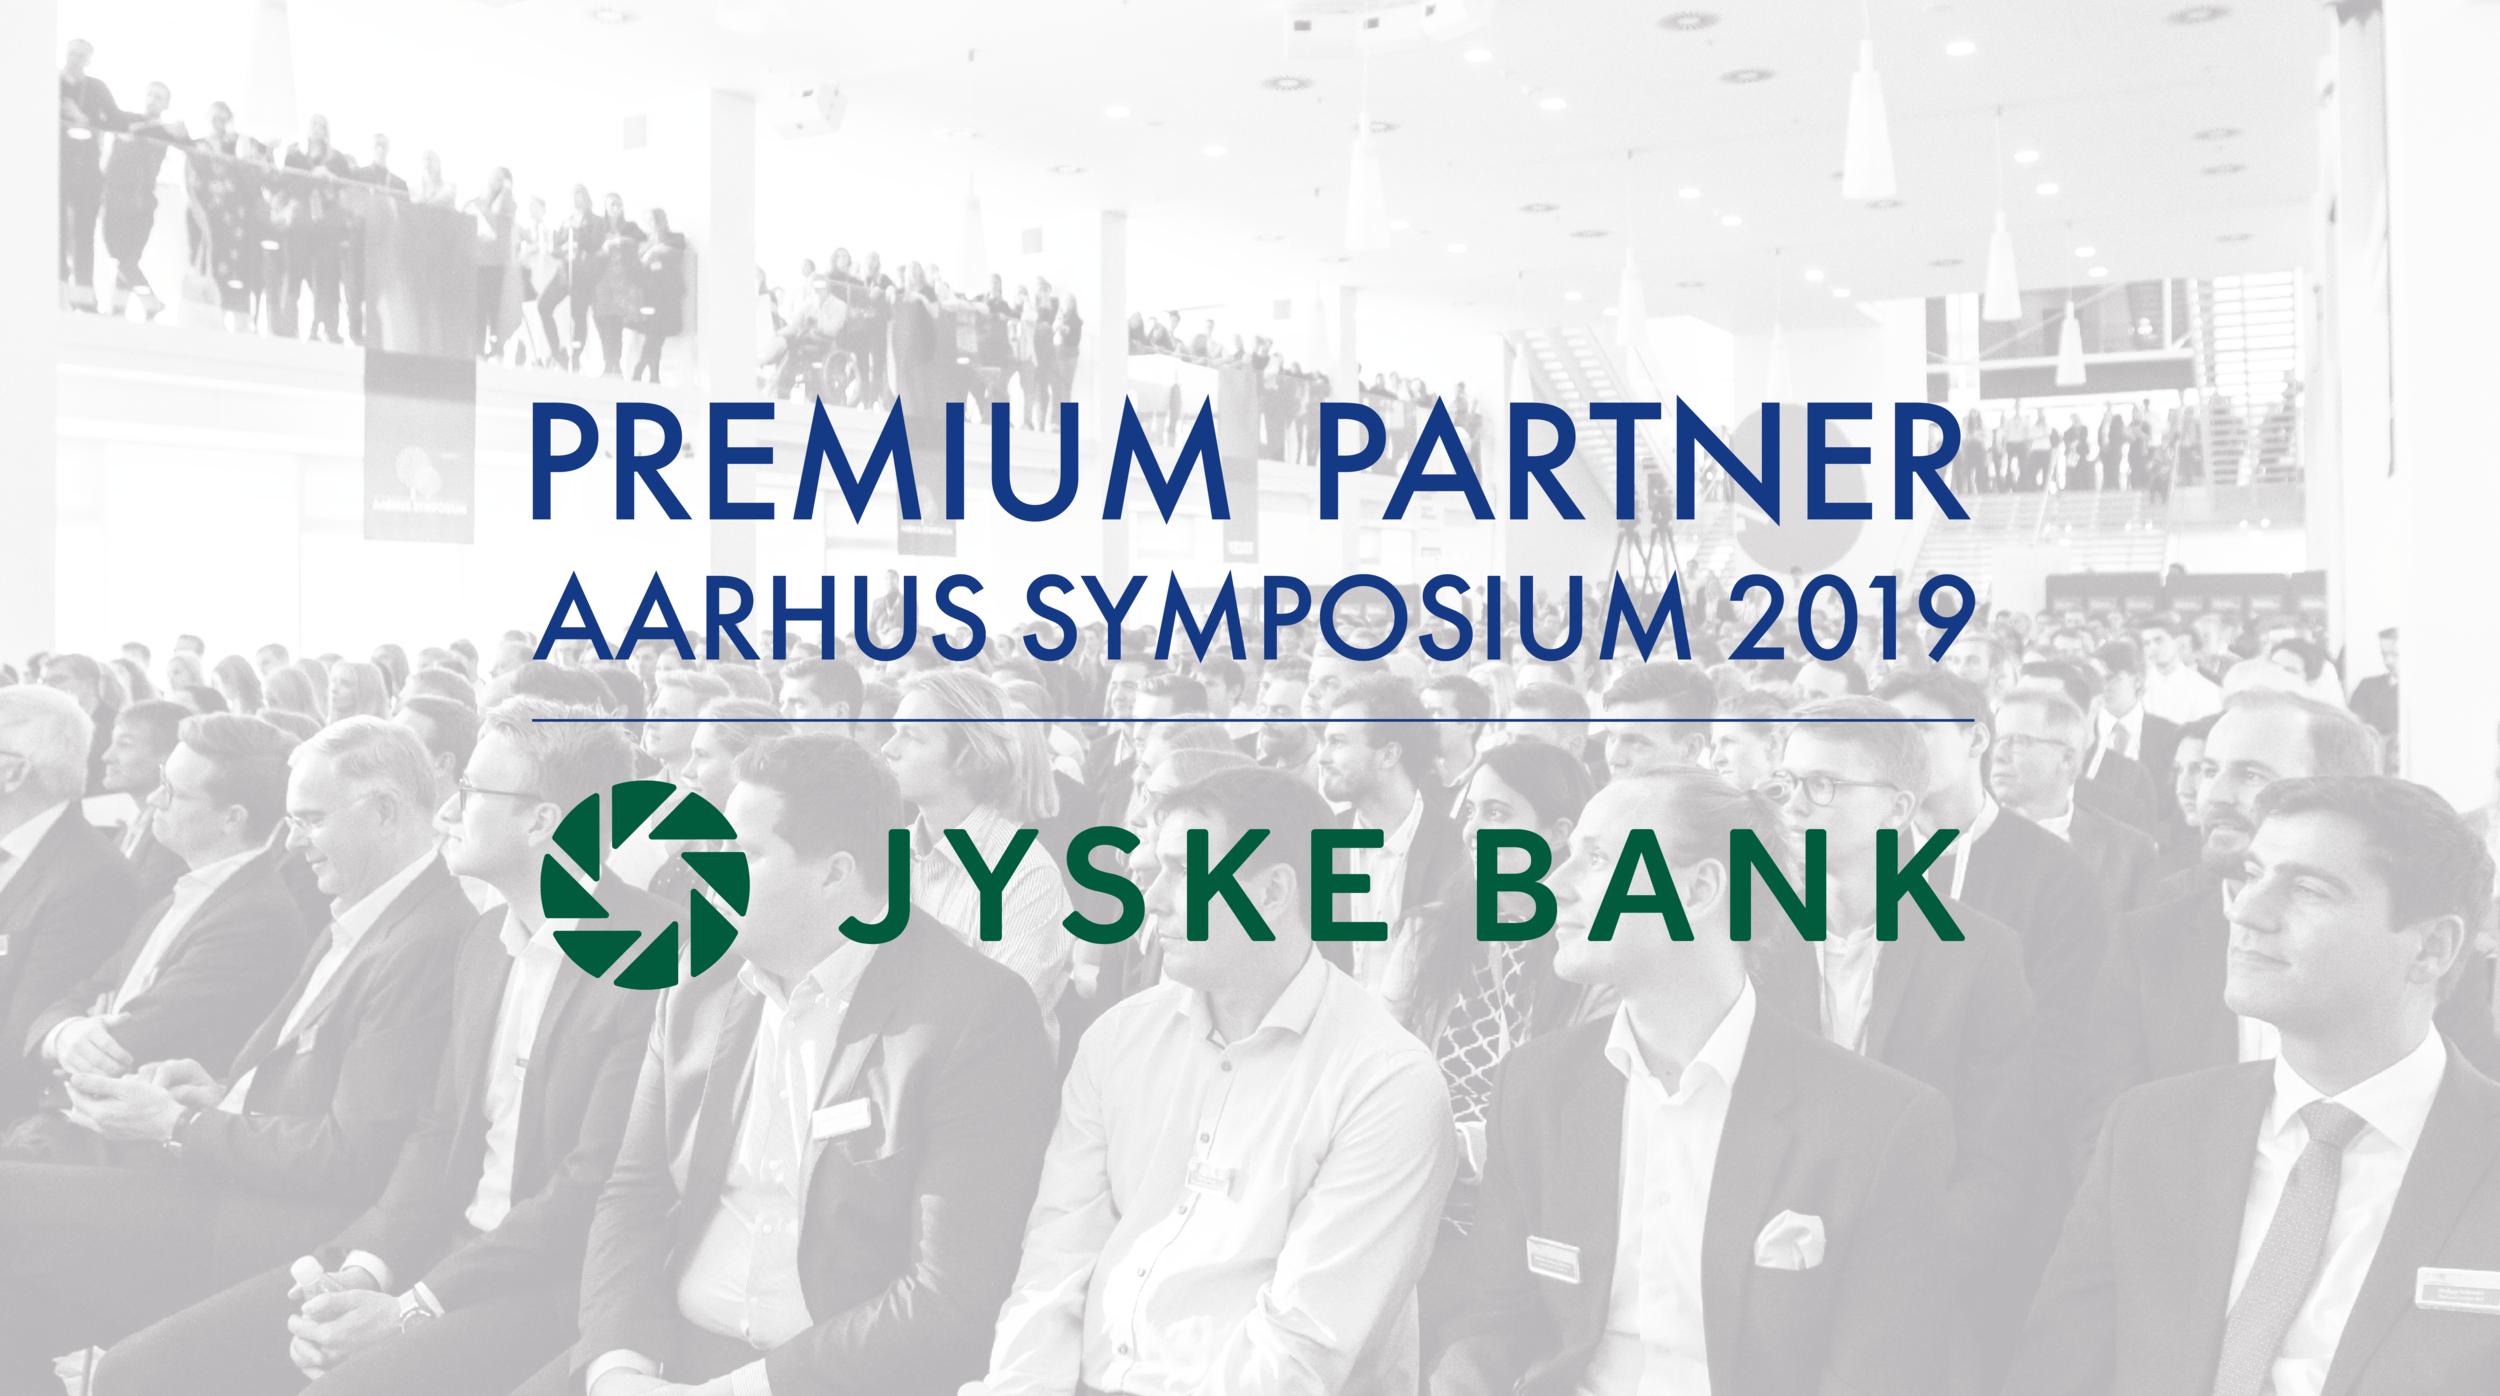 04.09.2019__Jyskebank_WEB.png